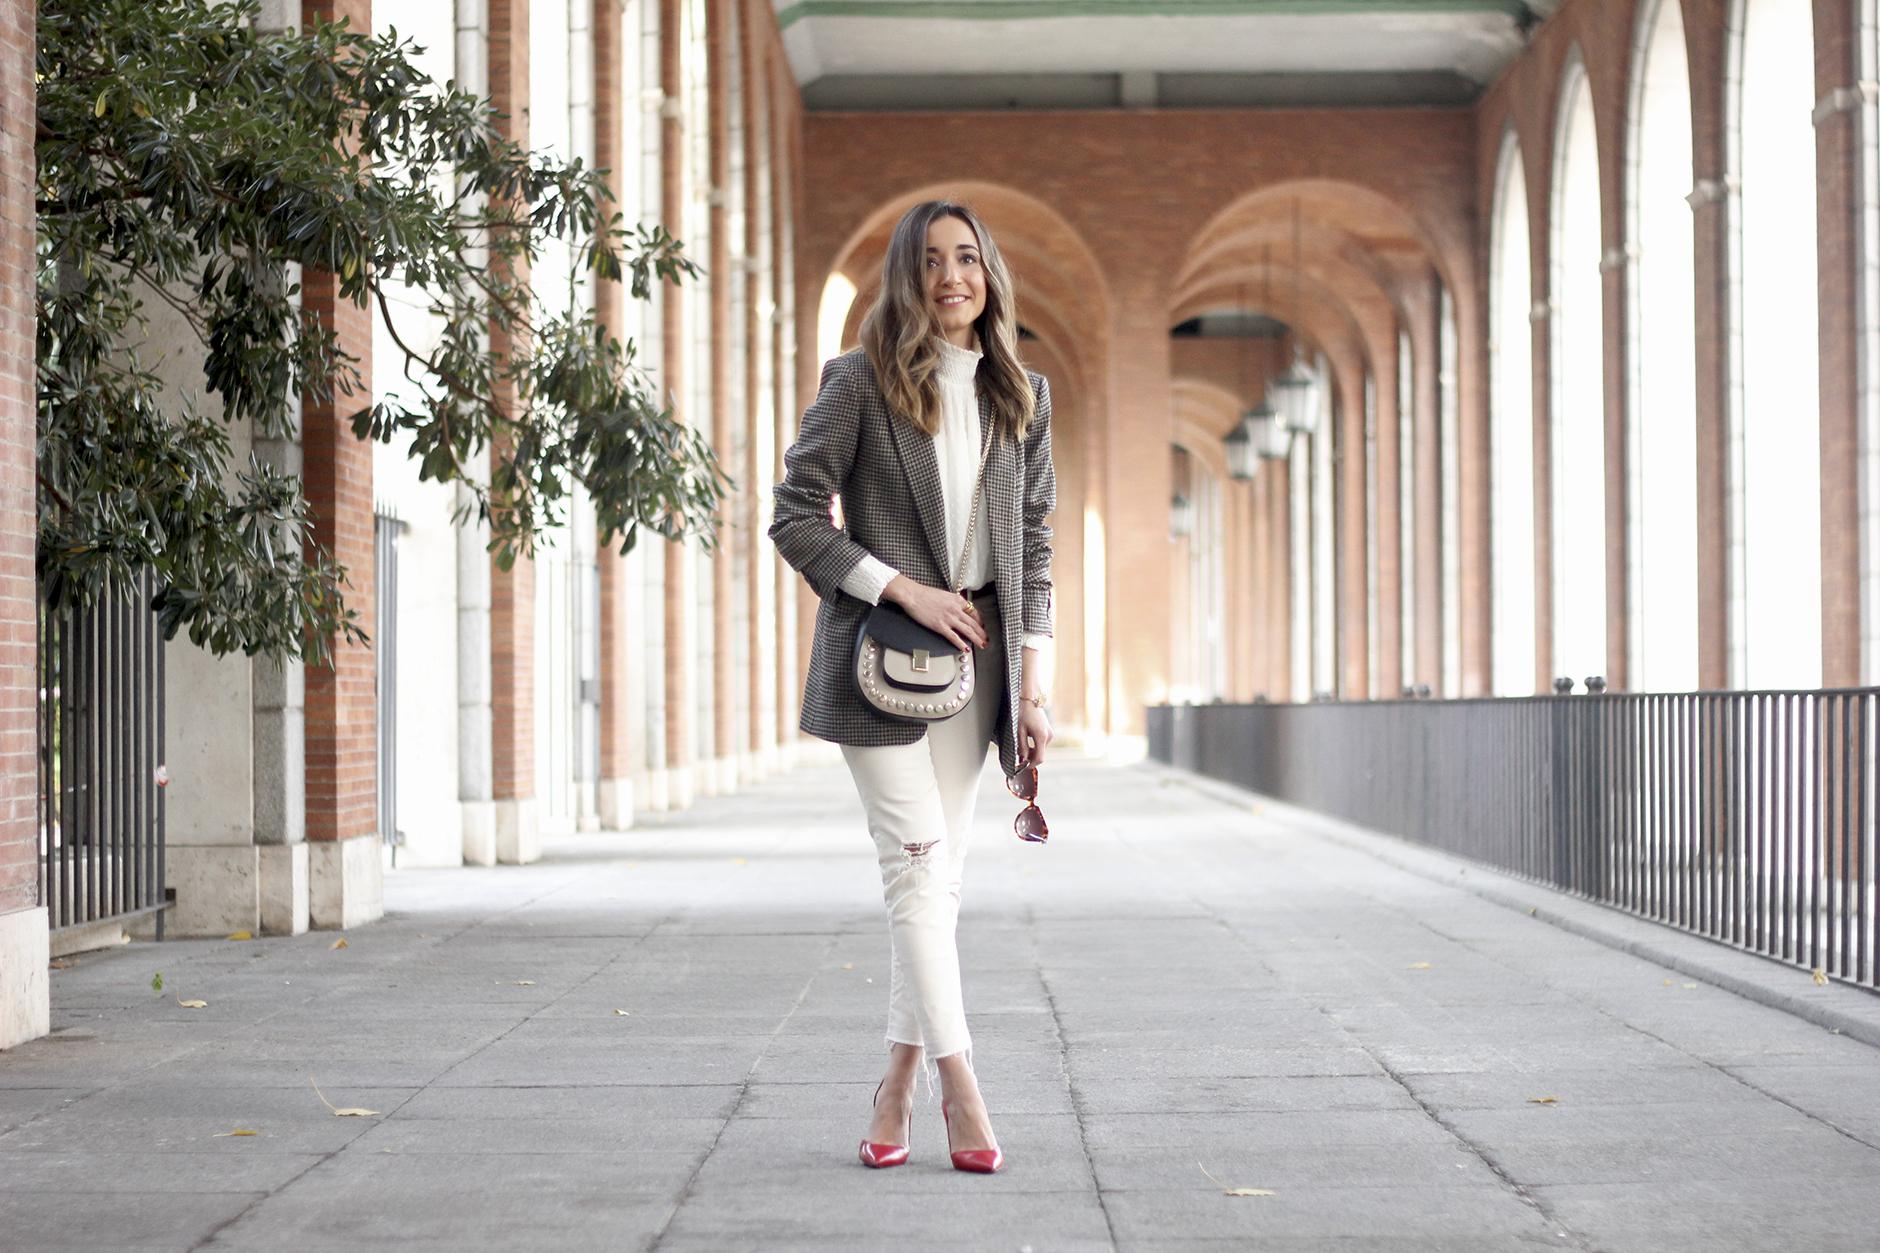 Plumeti blouse houndstooth blazer white jeans outfit style streetstyle14